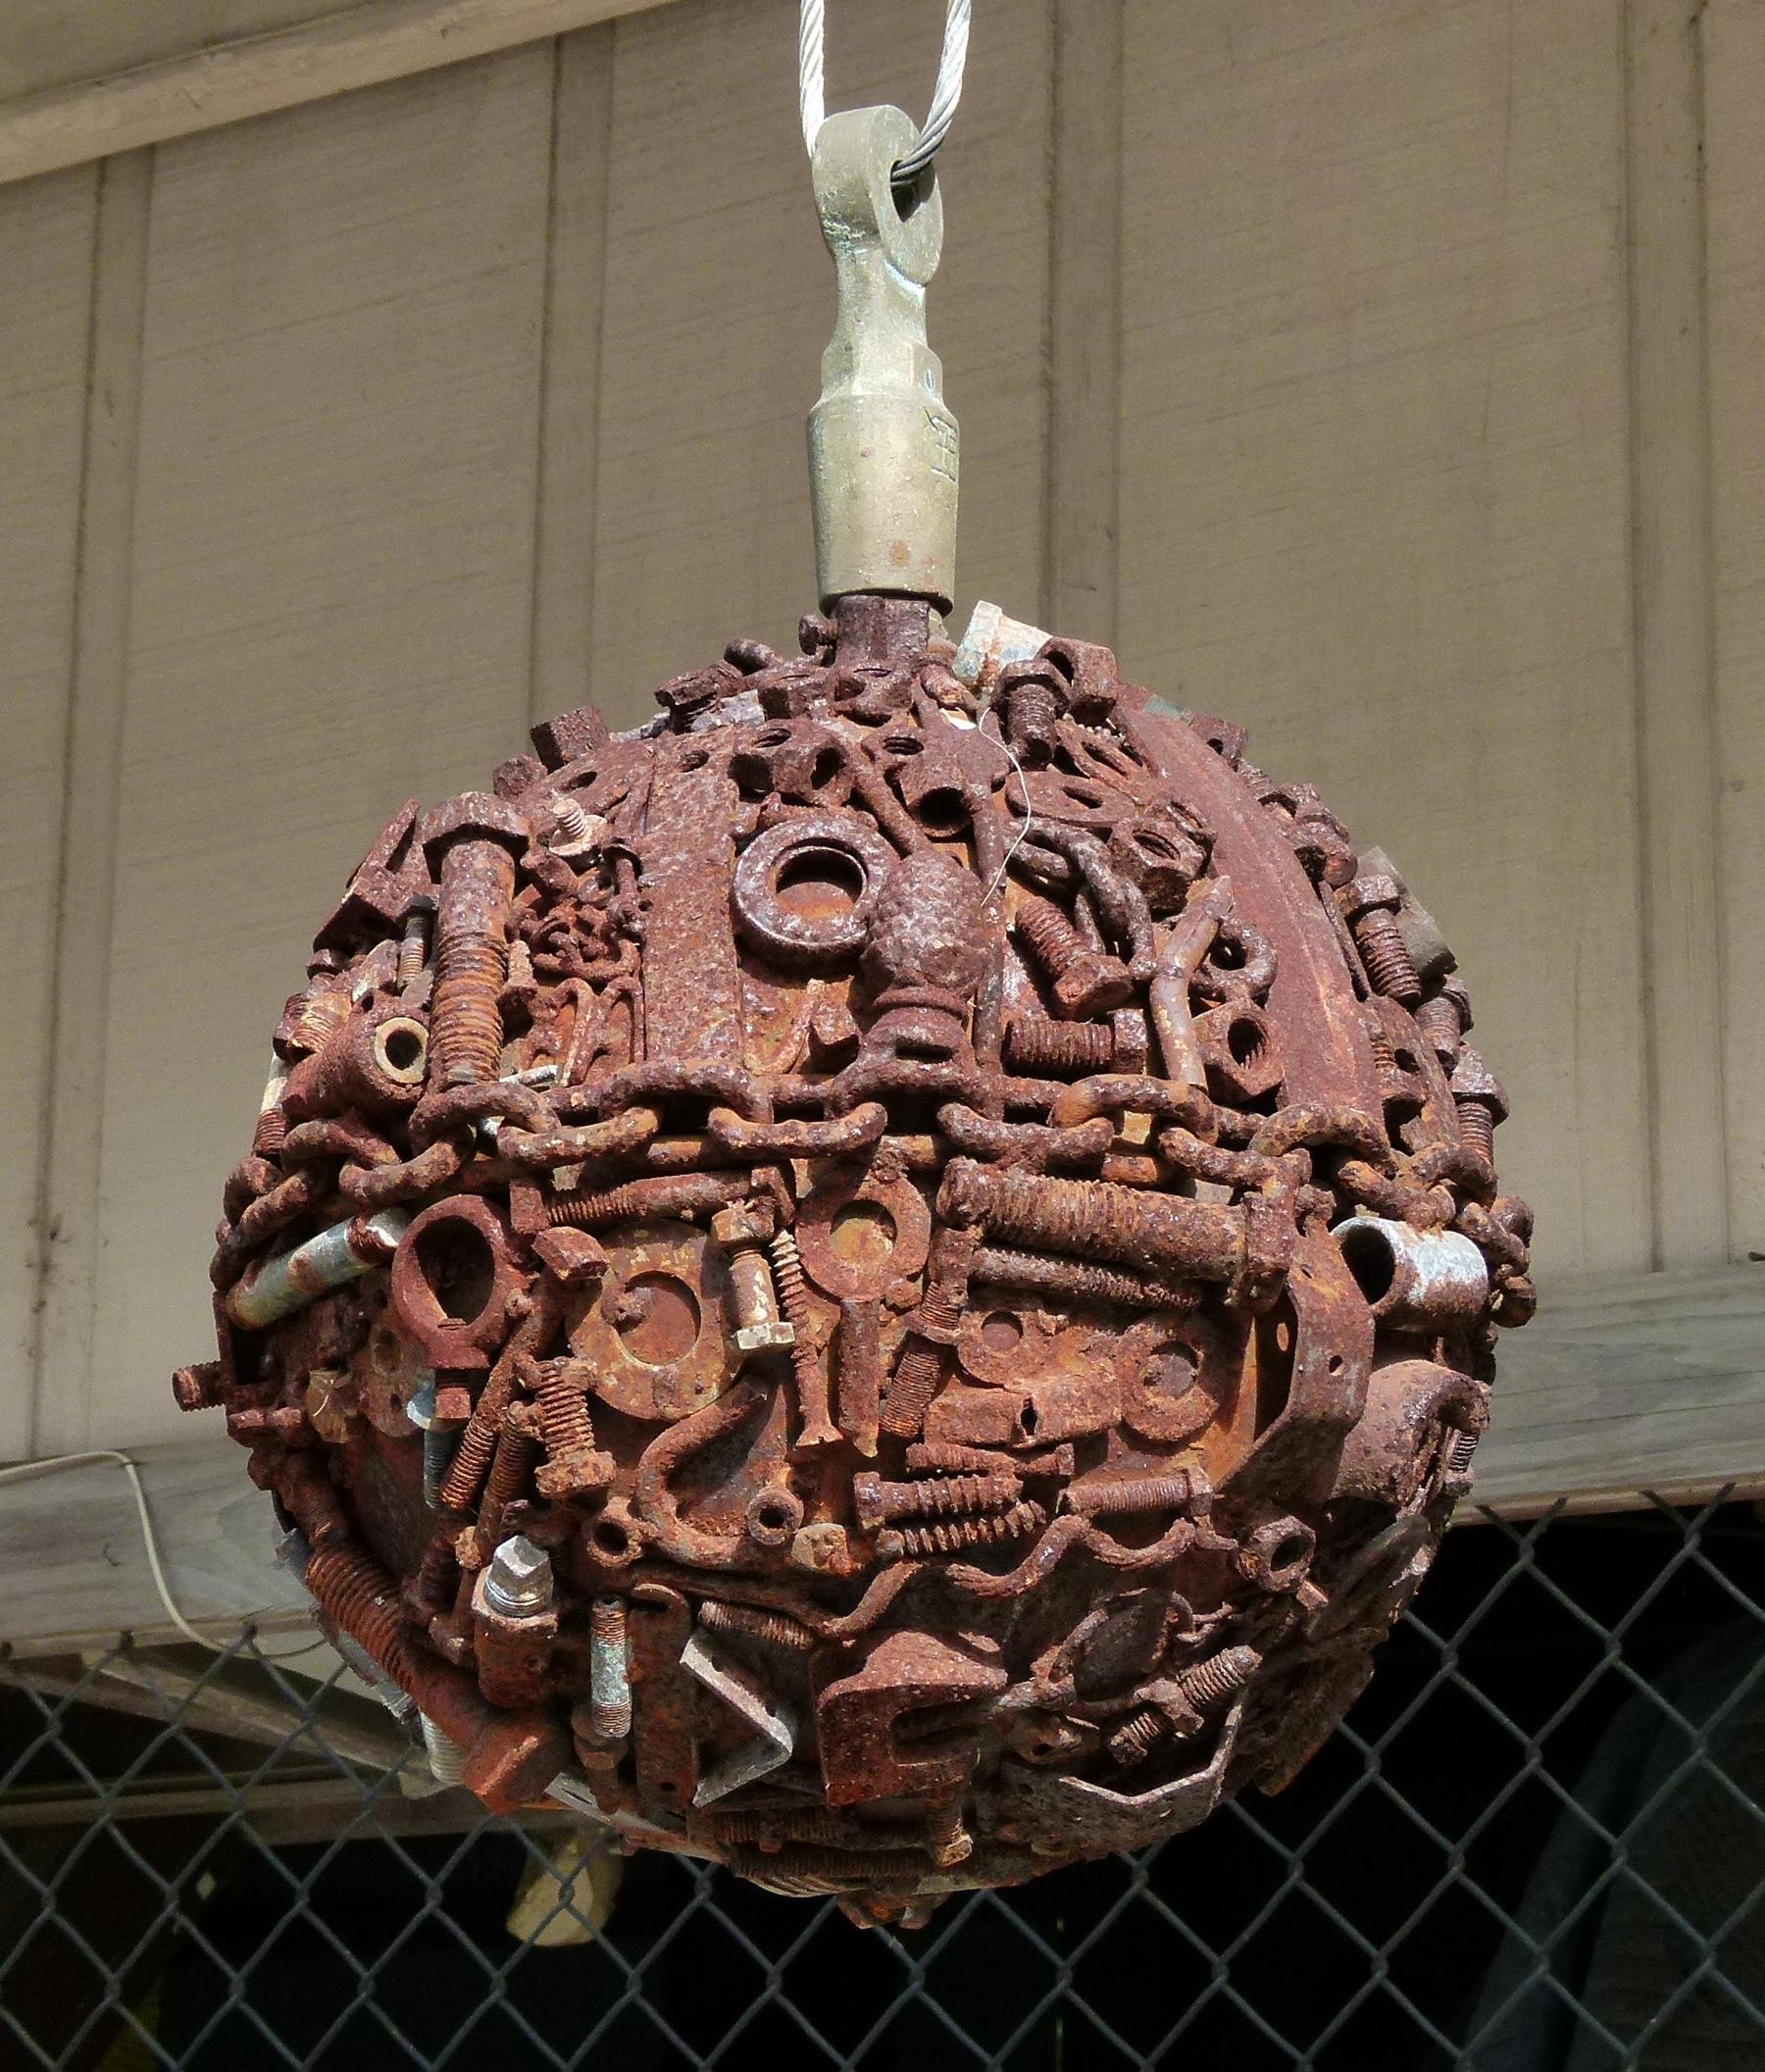 piece iron sculpture hanging si - oldendaze | ello